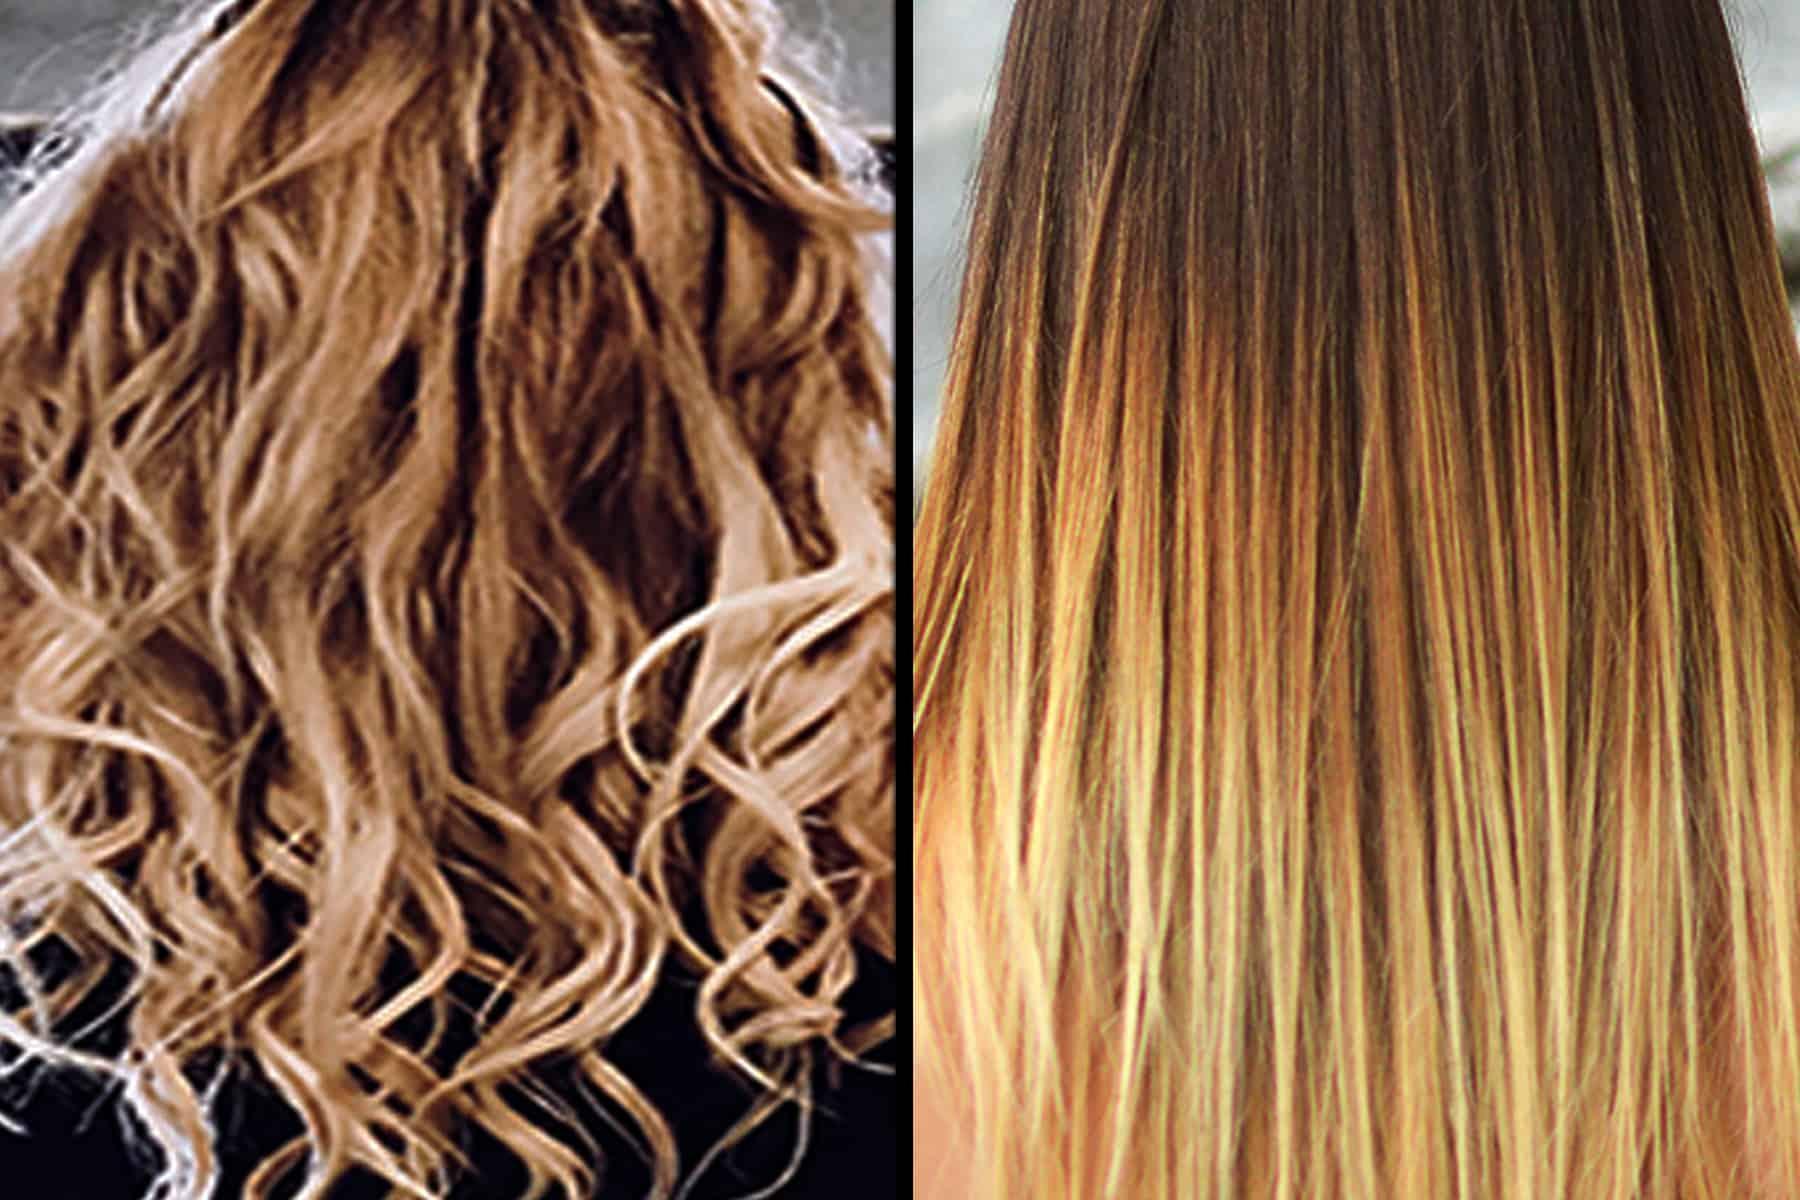 Permanent hair straightening - How